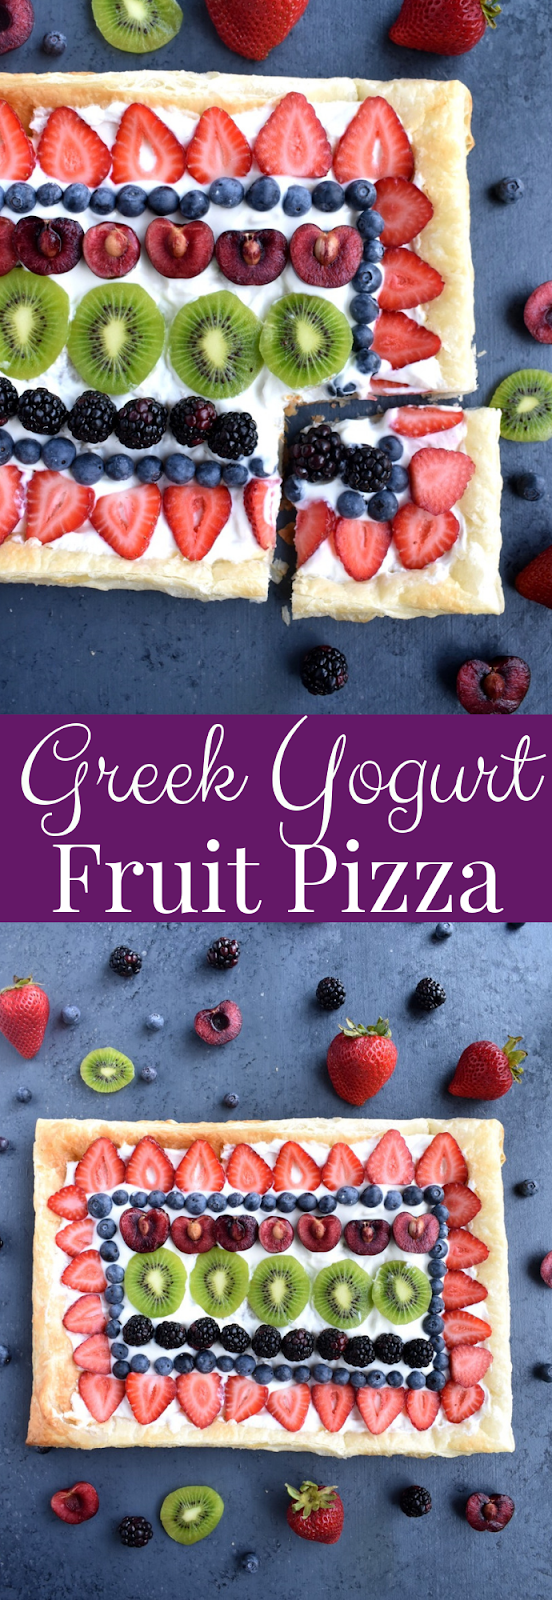 Greek Yogurt Fruit Pizza recipe